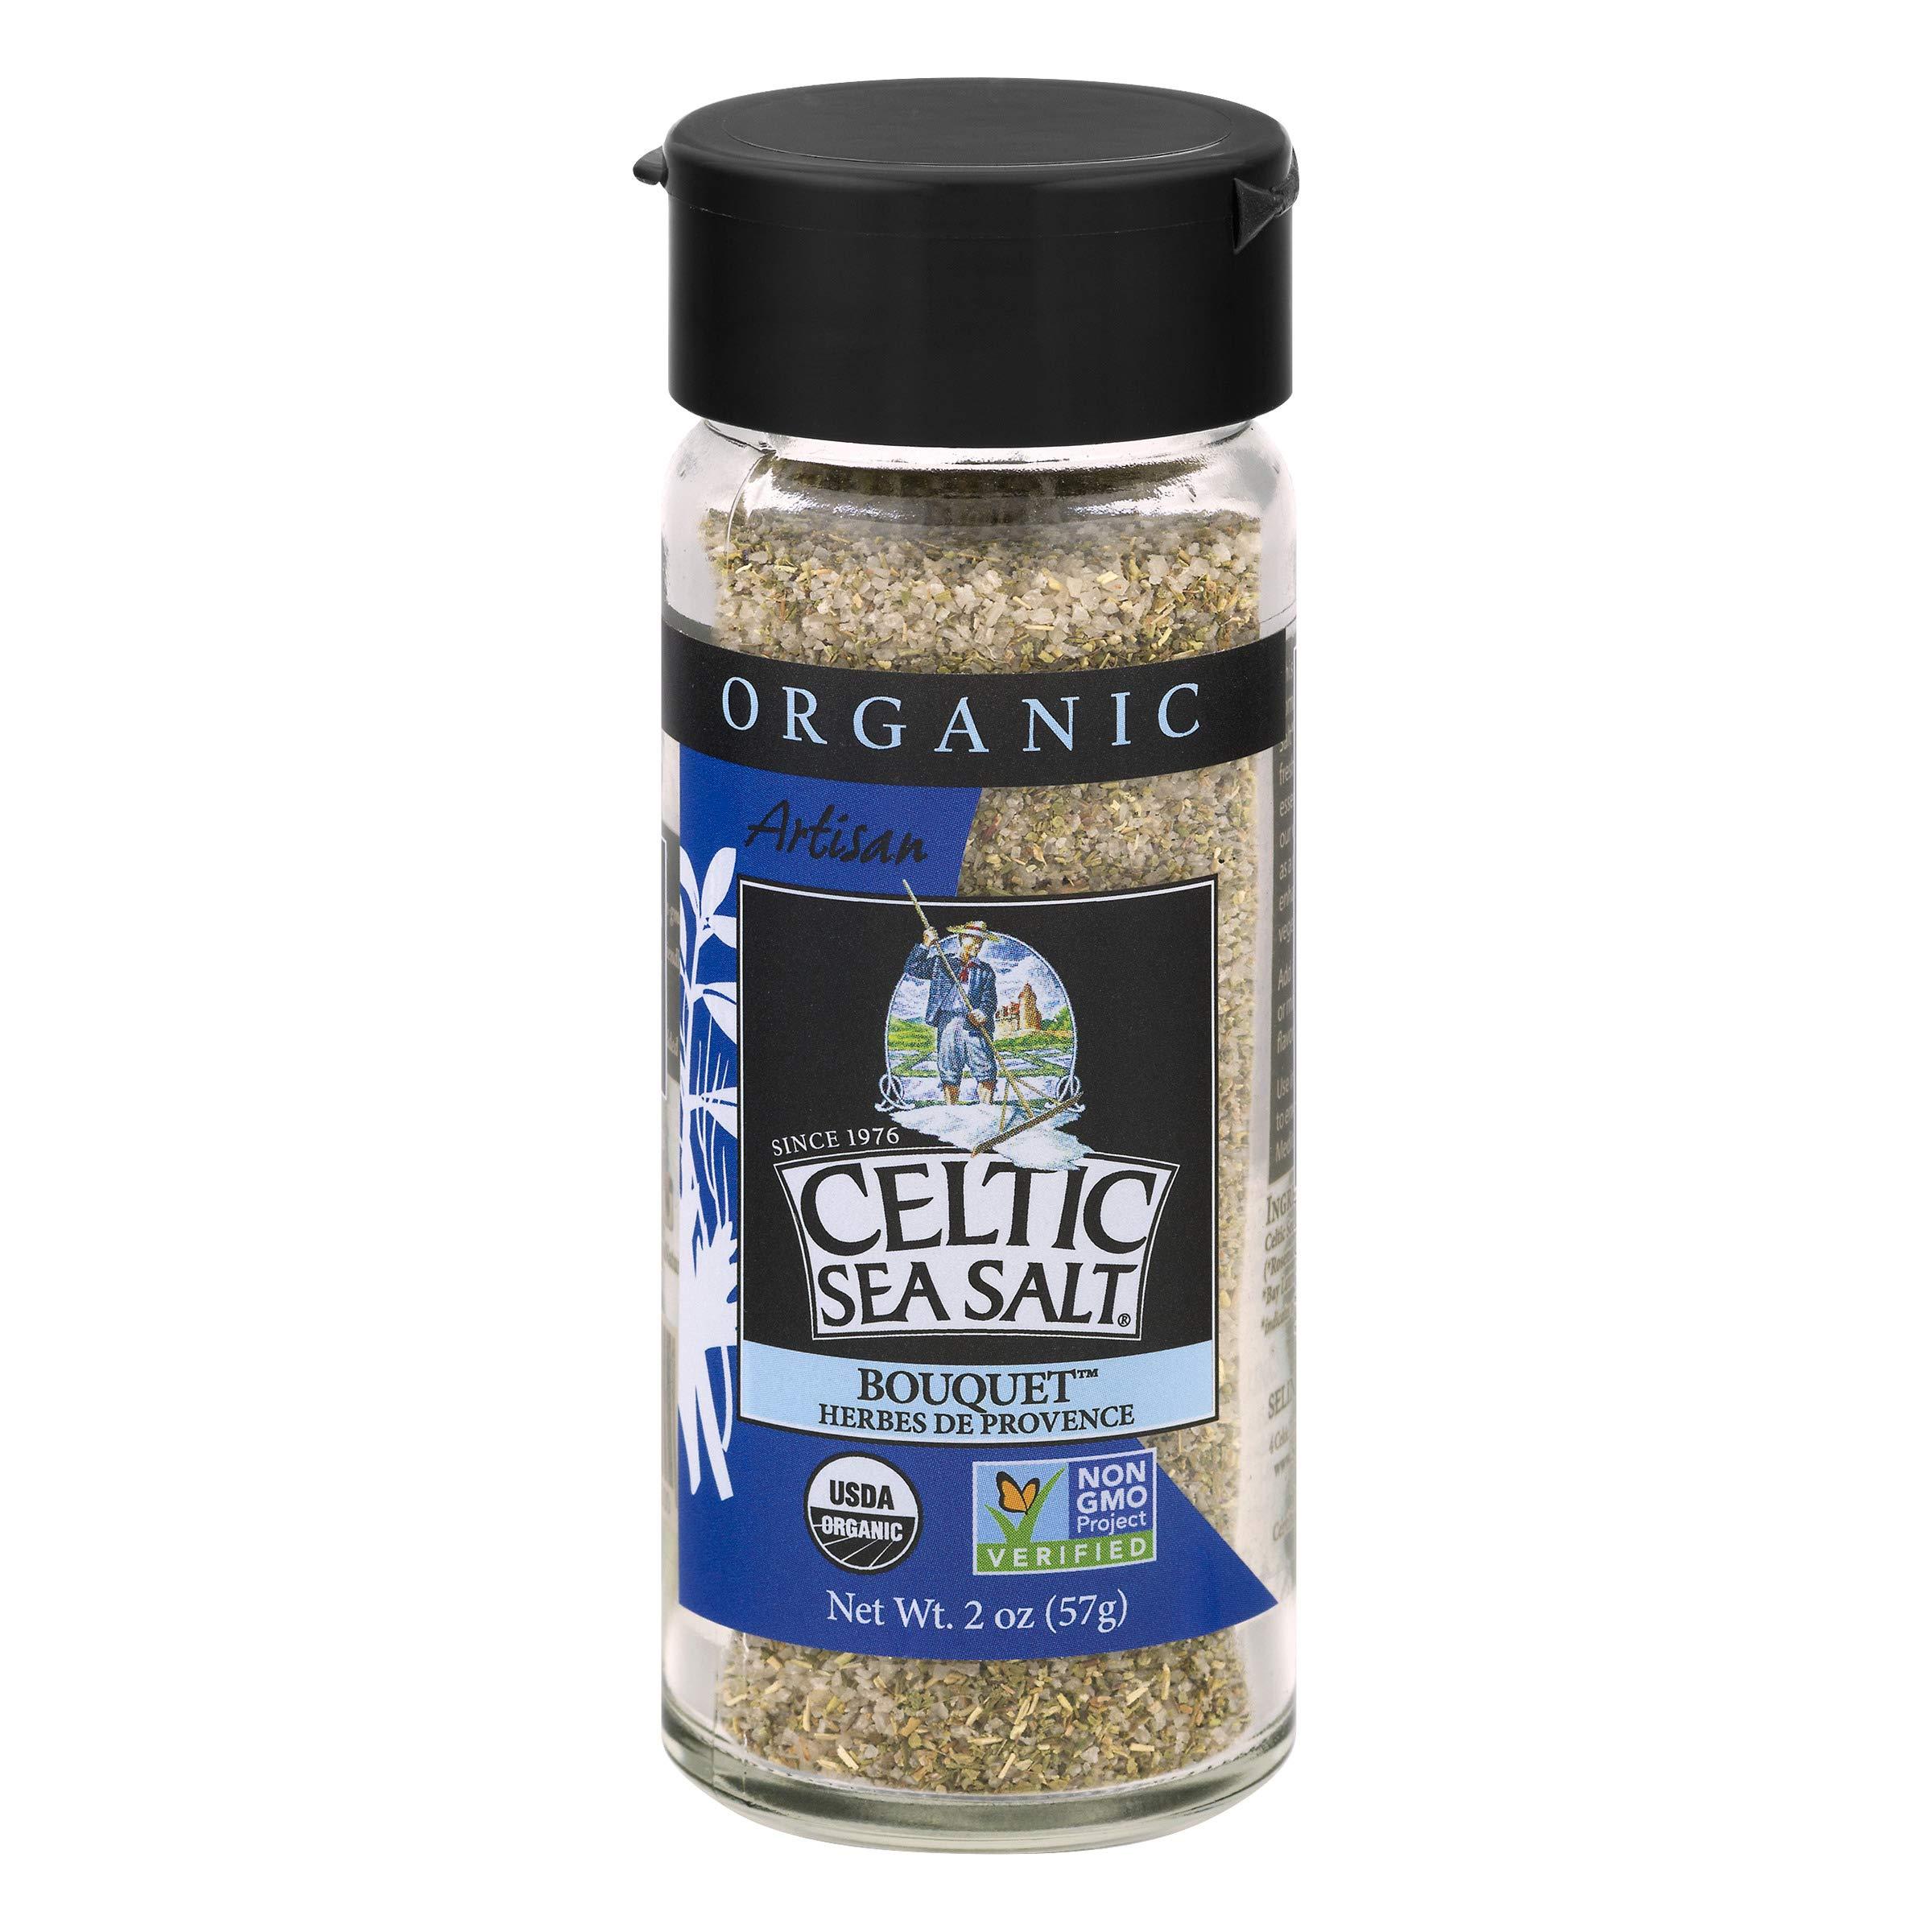 Gourmet Celtic Sea Salt Organic Herbes De Provence Shaker – Classic, Versatile Herbes De Provence Blend of Herbs and Salt, Hand Crafted and Organic, 2 Ounces